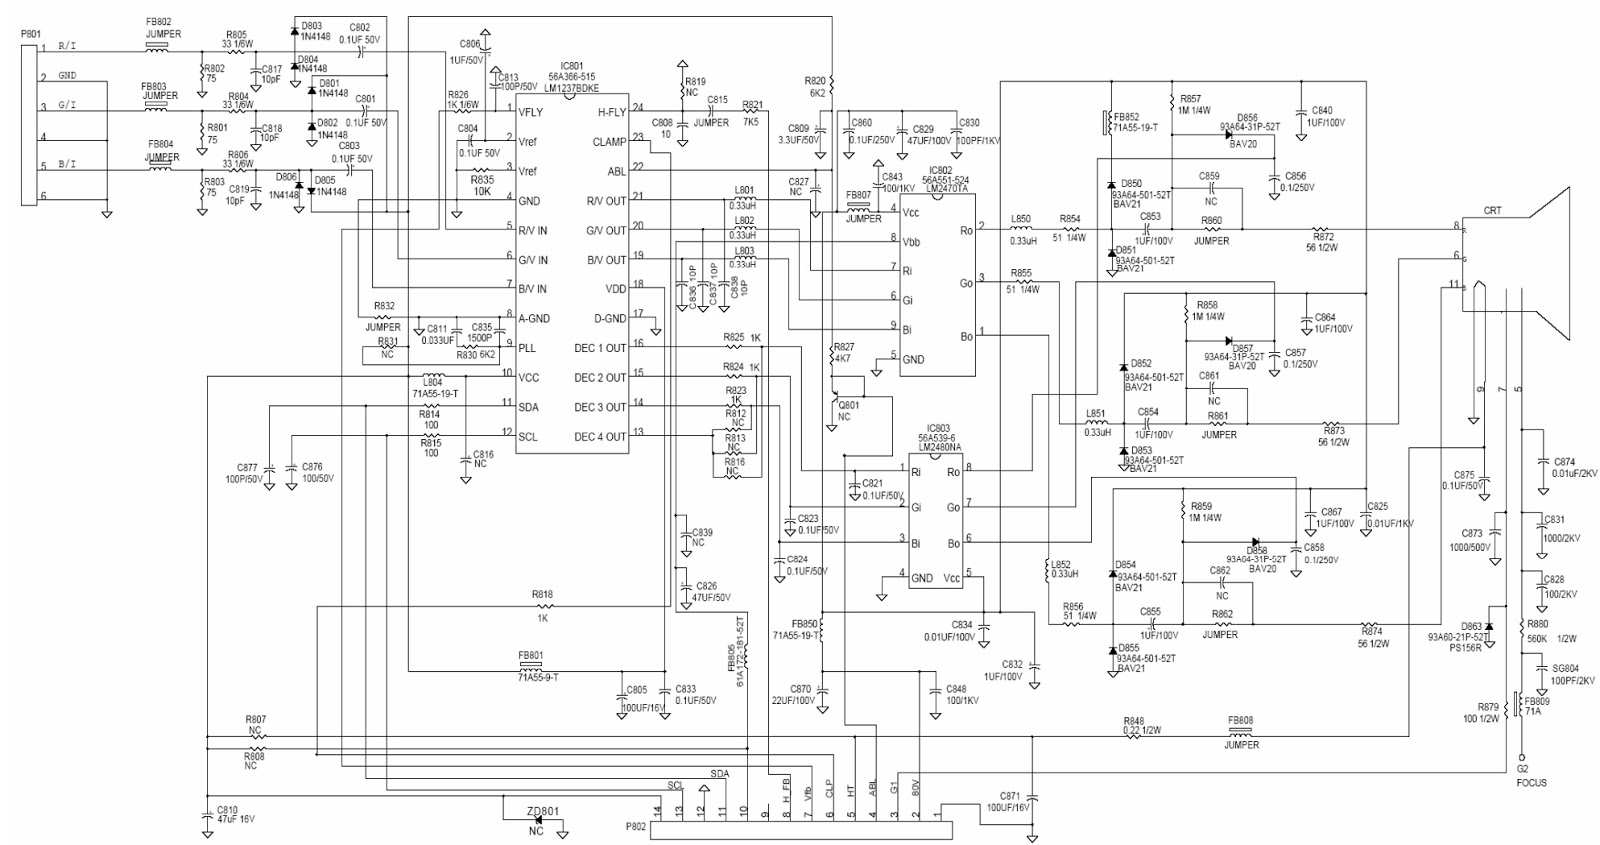 crt screen schematic wiring diagram crt monitor schematic diagram schema wiring diagramhp 7540 17 inch crt [ 1600 x 845 Pixel ]